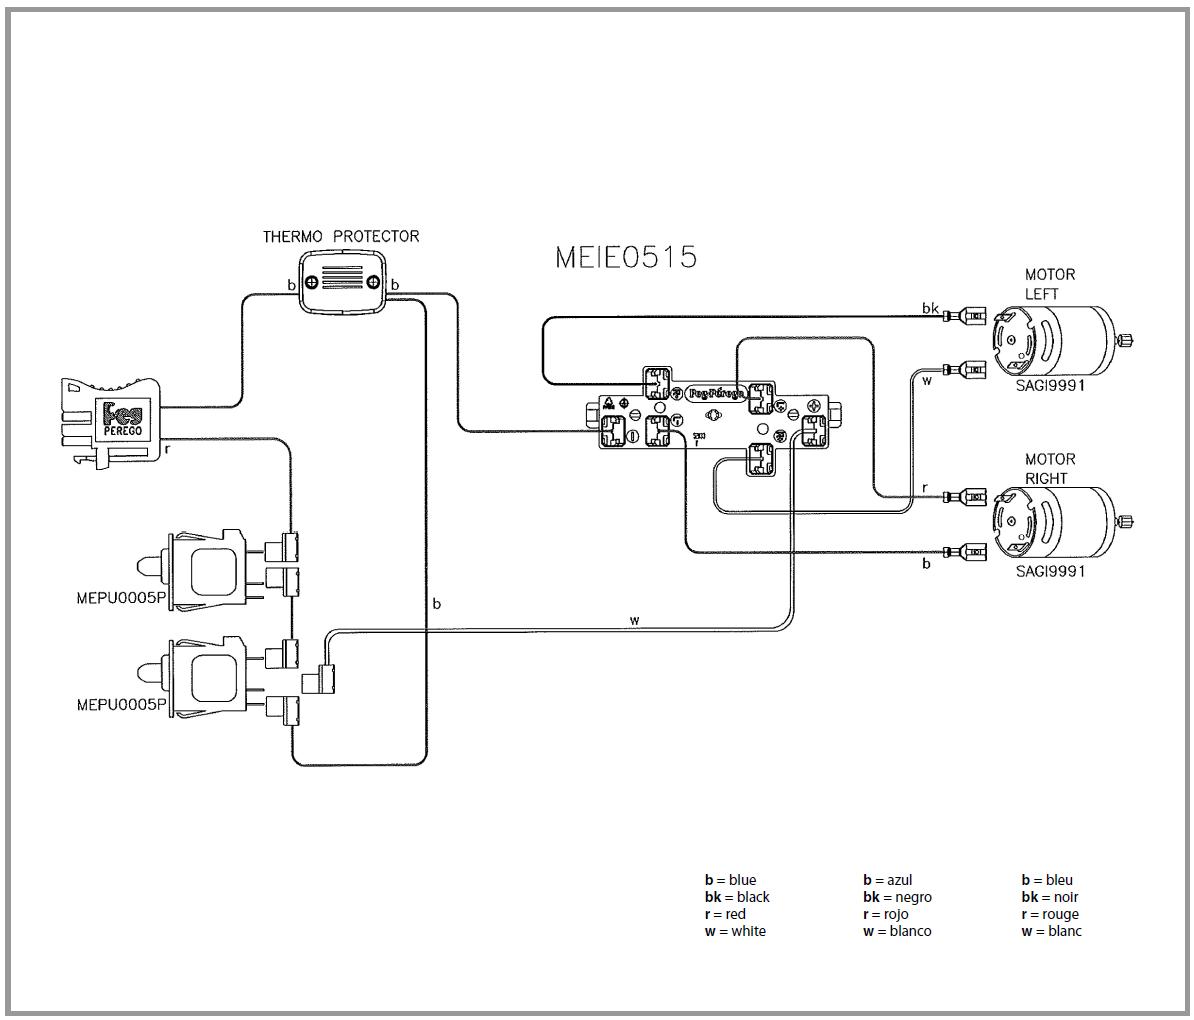 2005 Polaris Sportsman 500 Owners Manual 800 Efi Wiring Diagram Diagrams Service Pdf Ho Image Not Found